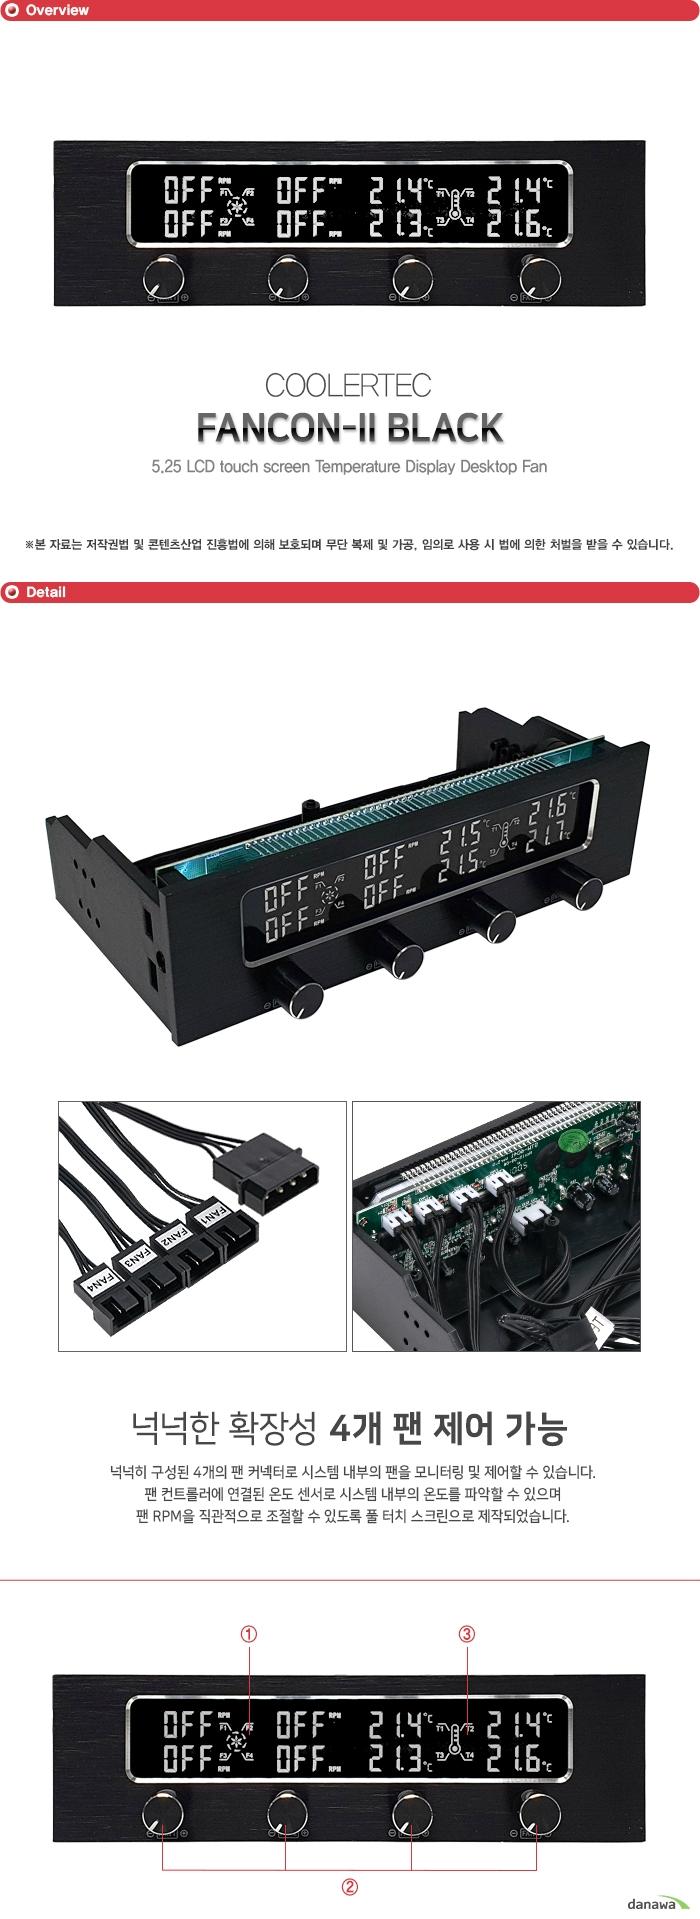 COOLERTEC FANCON-II BLACK 넉넉히 구성된 4개의 팬 커넥터로 시스템 내부의 팬을 모니터링 및 제어할 수 있습니다. 팬 컨트롤러에 연결된 온도 센서로 시스템 내부의 온도를 파악할 수 있으며 팬 RPM을 직관적으로 조절할 수 있도록 풀 터치 스크린으로 제작되었습니다.